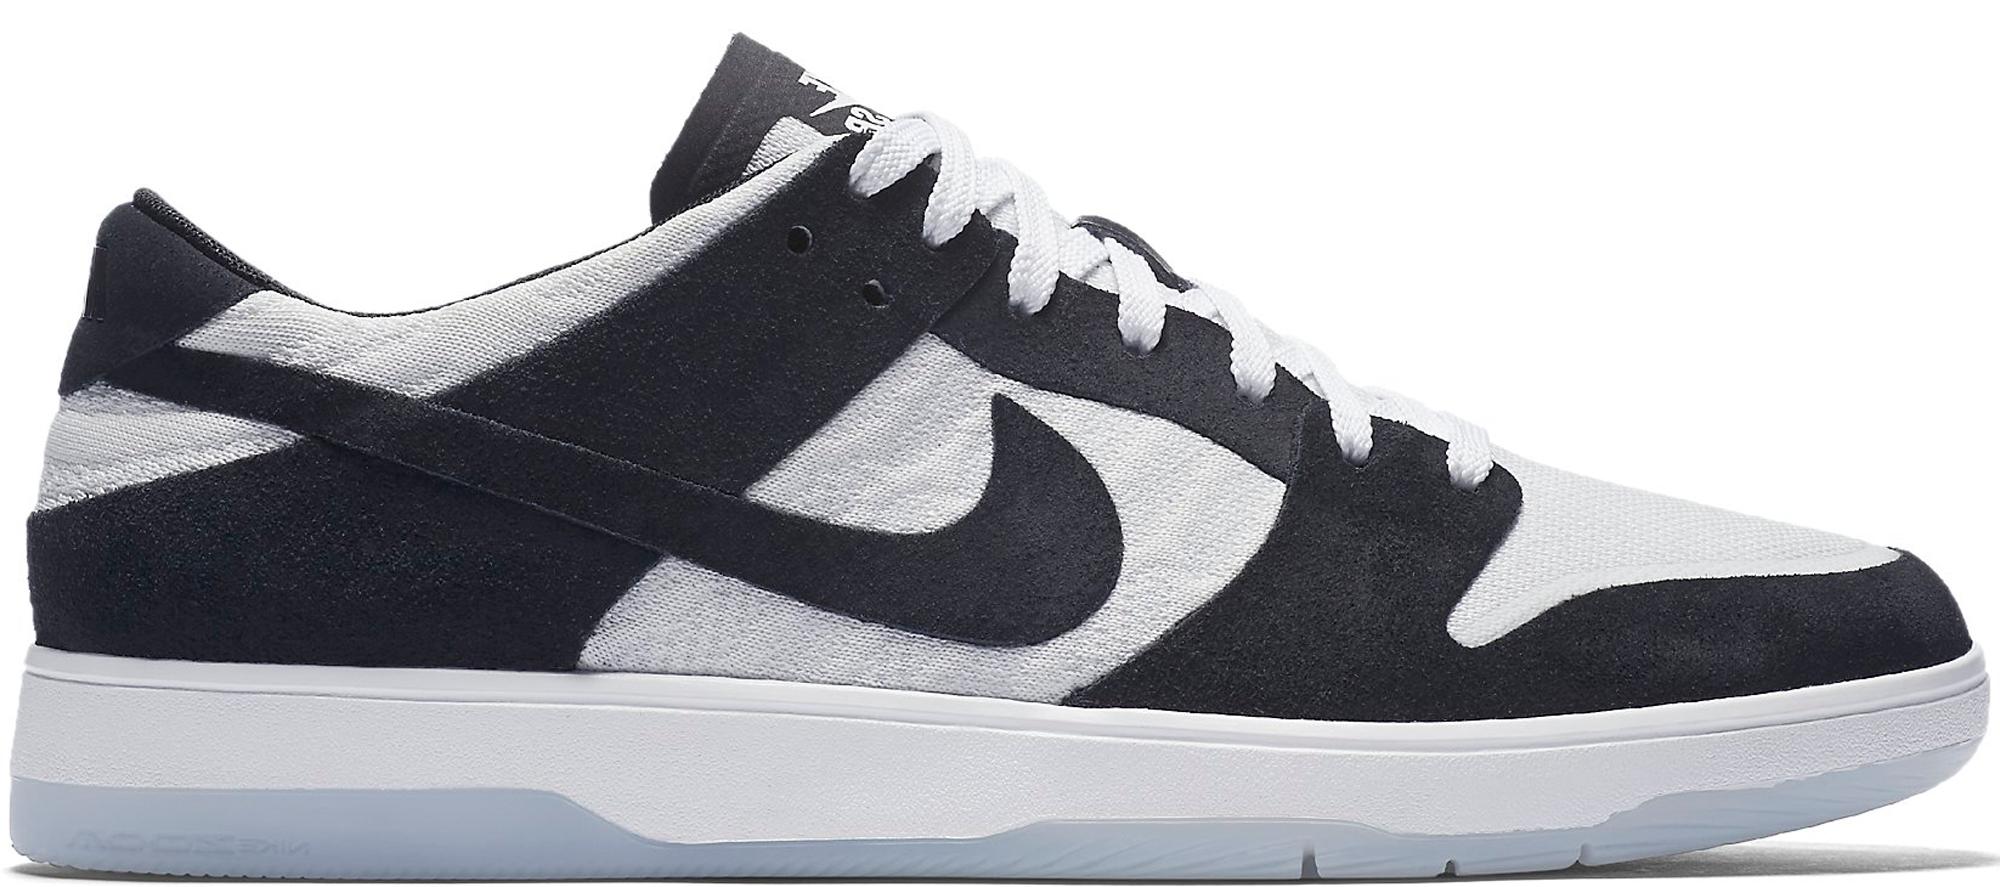 Nike SB Dunk Low Elite Oski - StockX News